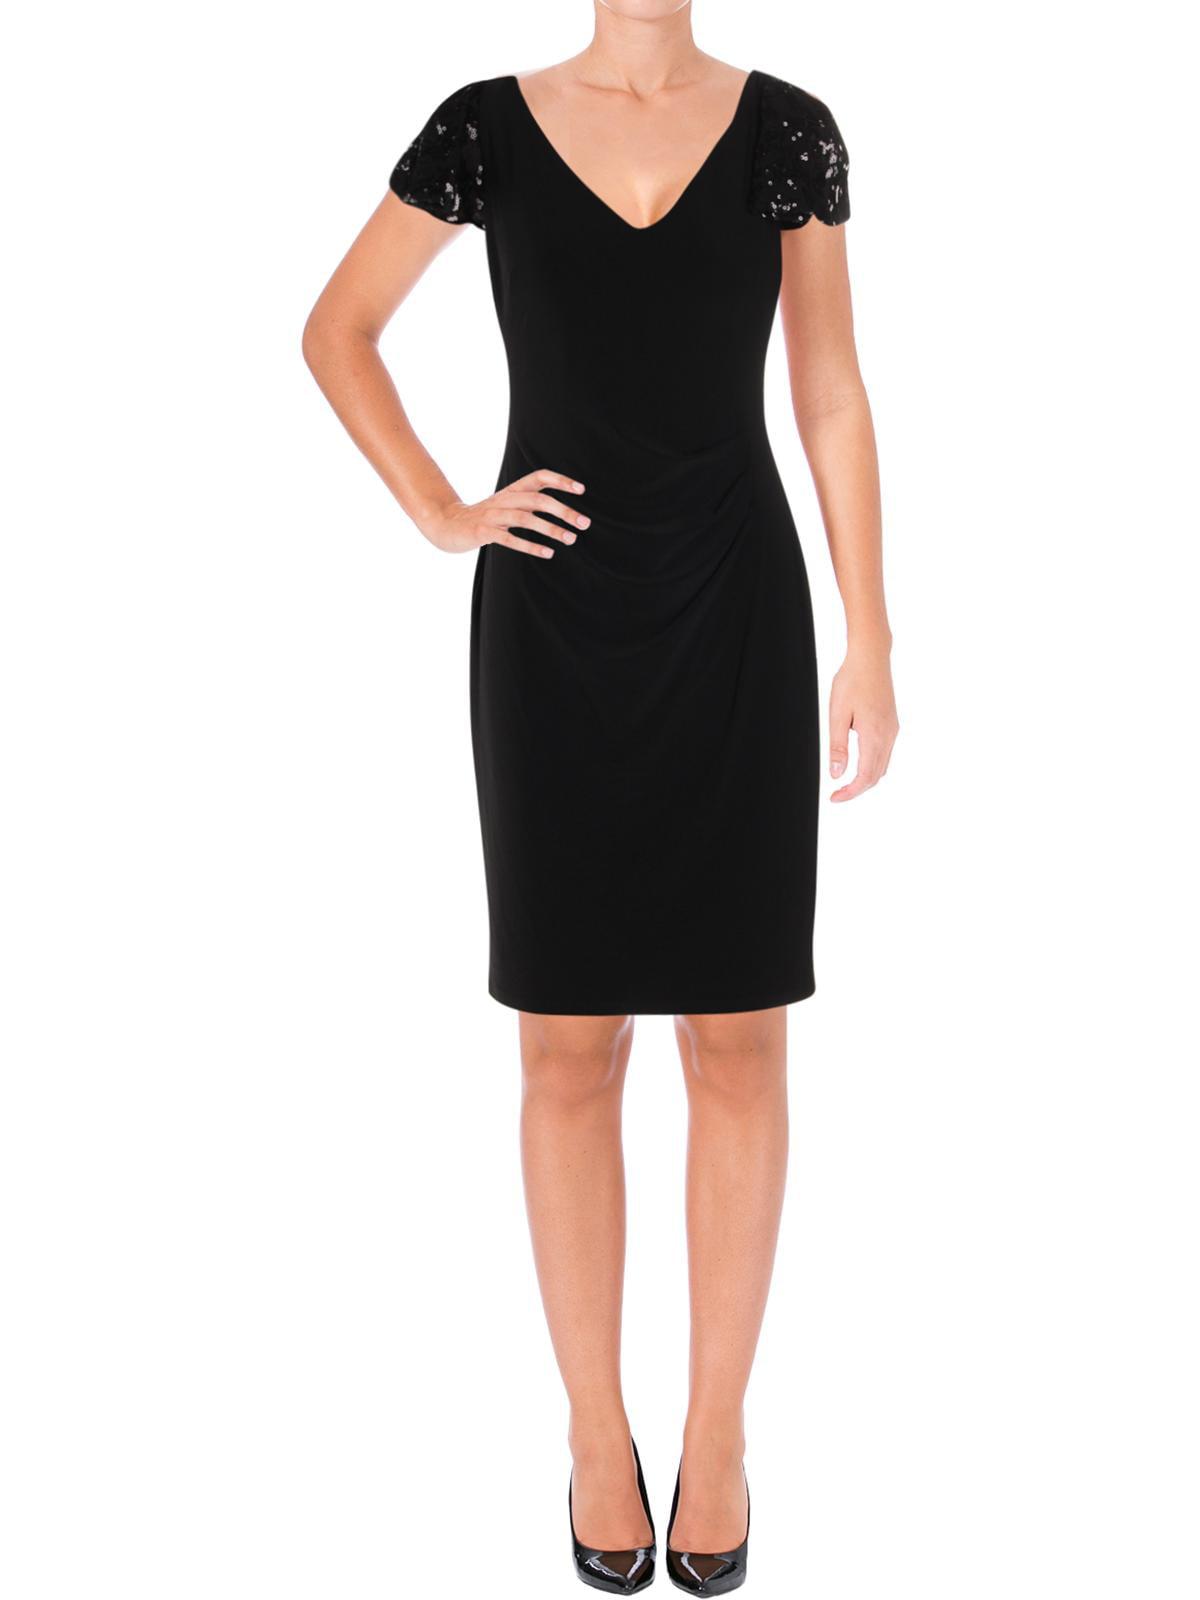 Lauren Ralph Lauren Womens Sequined Flutter Sleeve Cocktail Dress